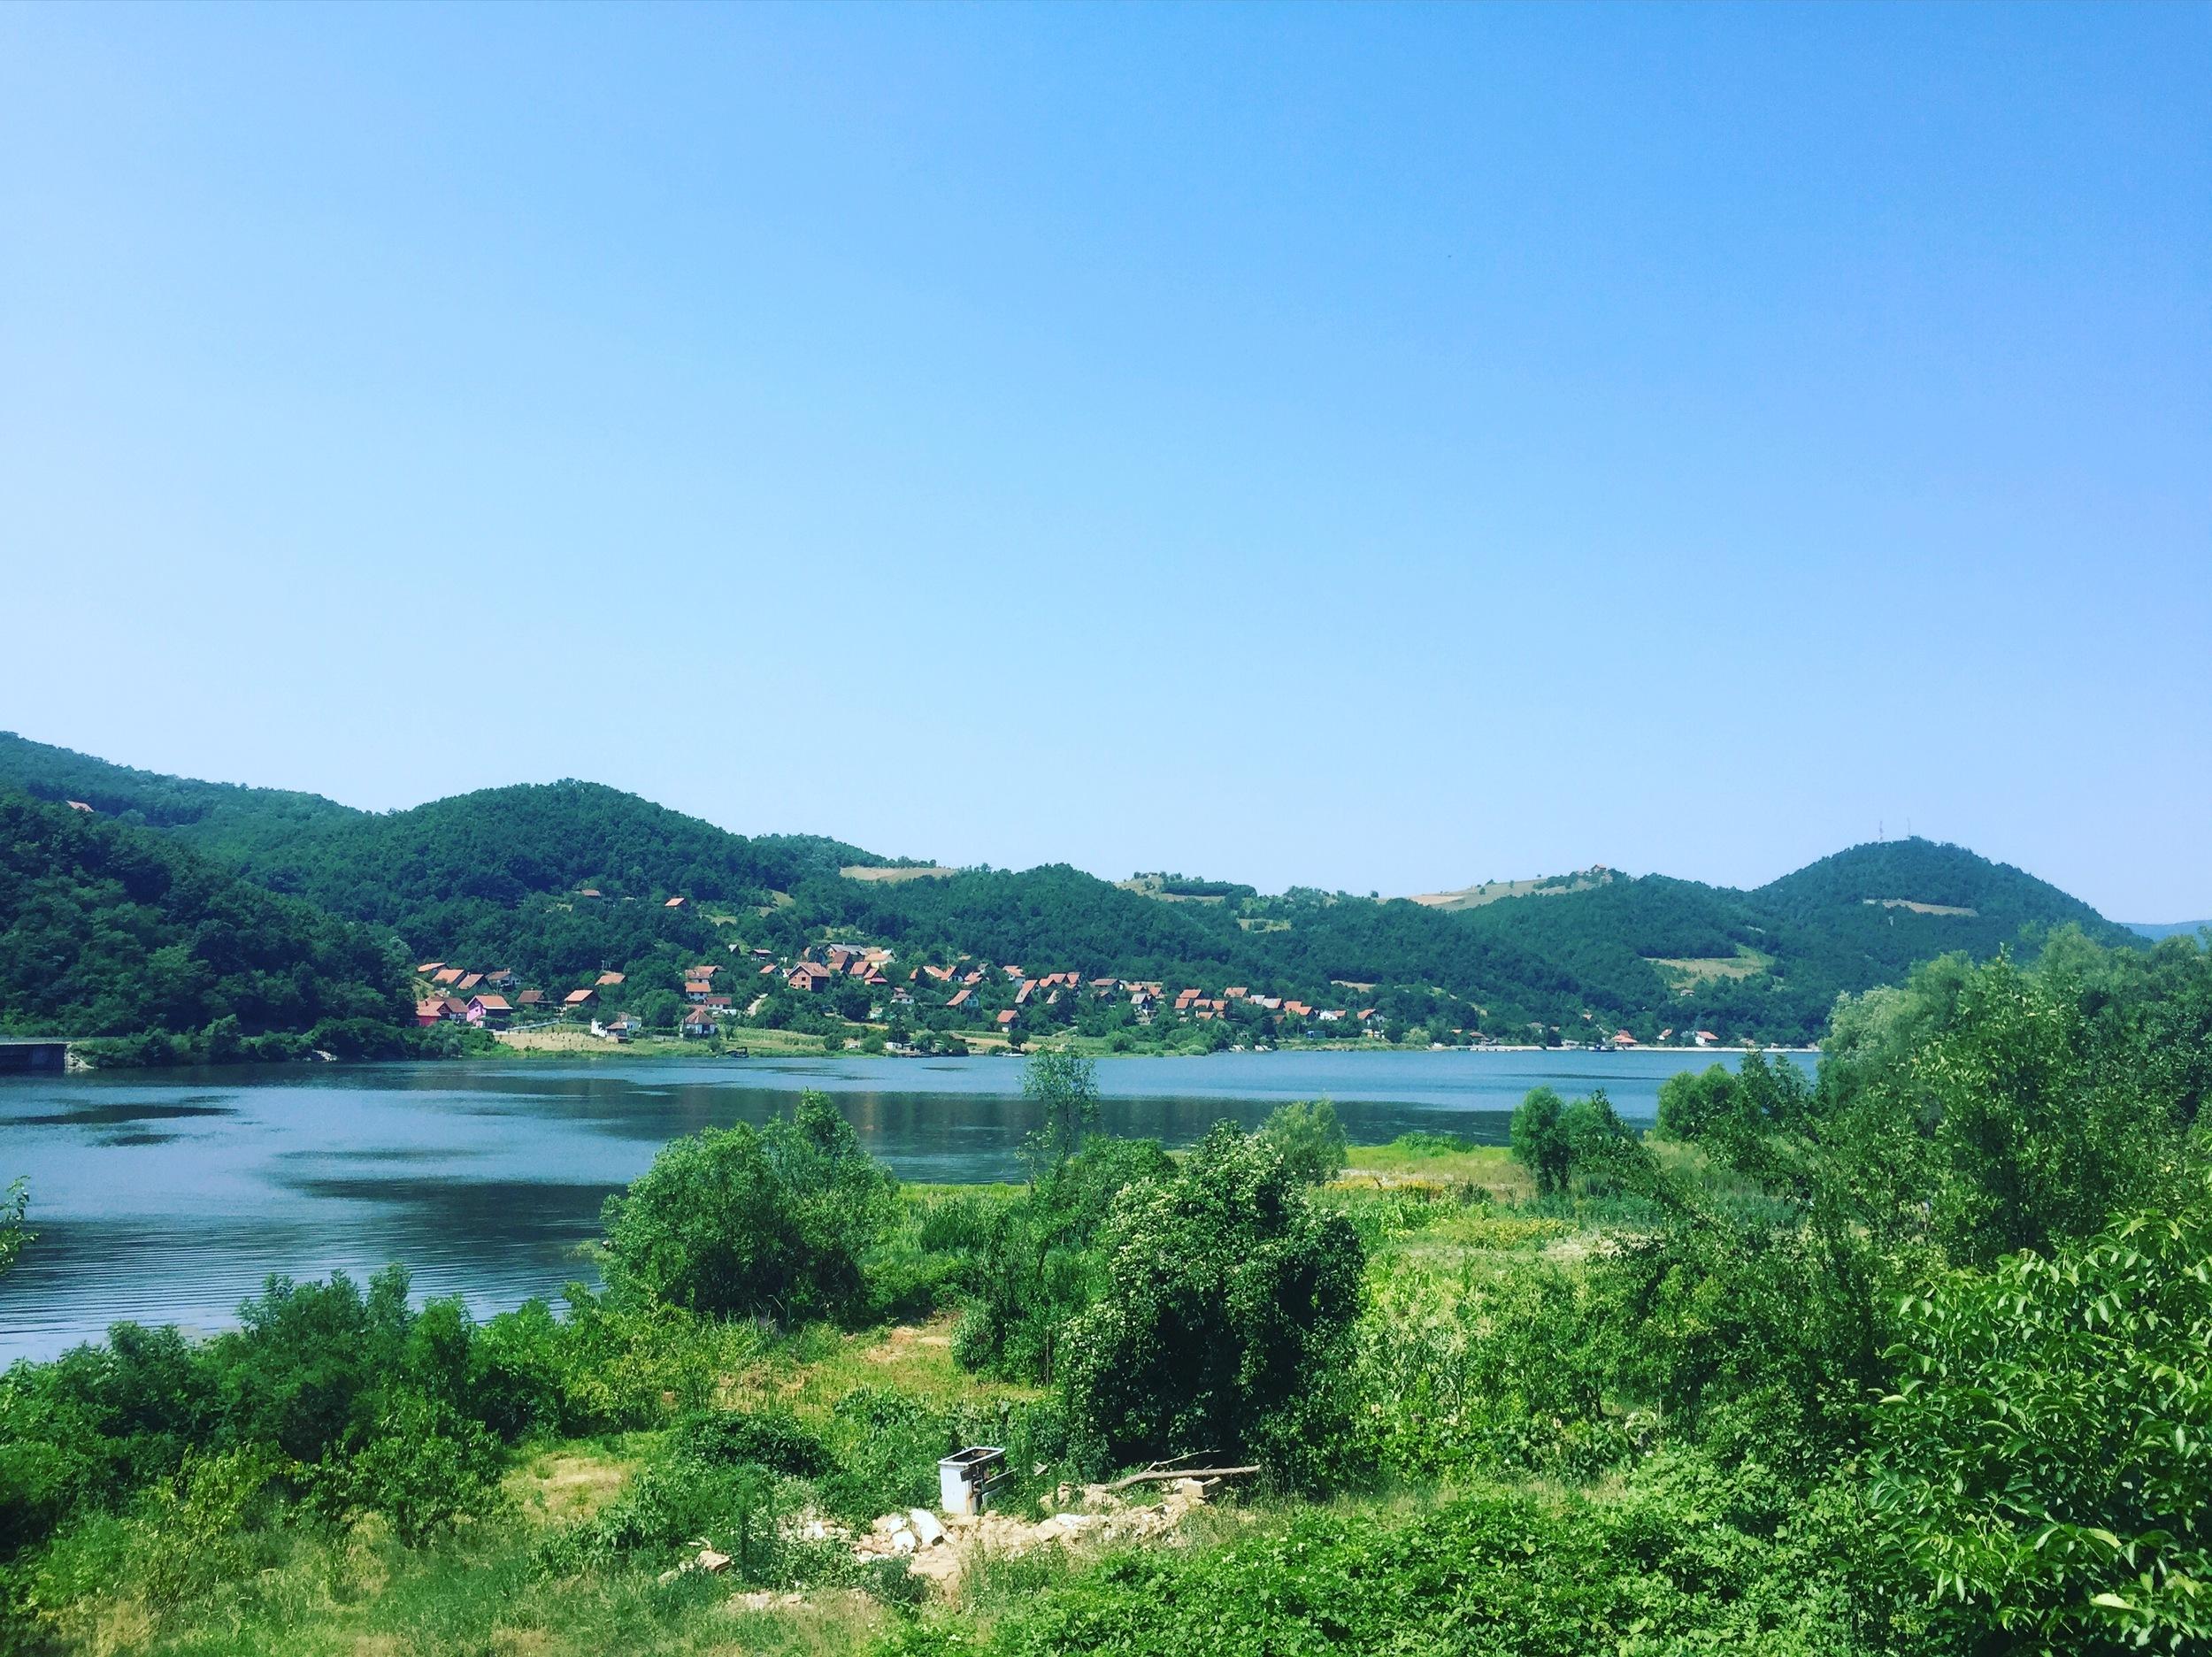 Staring at the Danube and at Romania